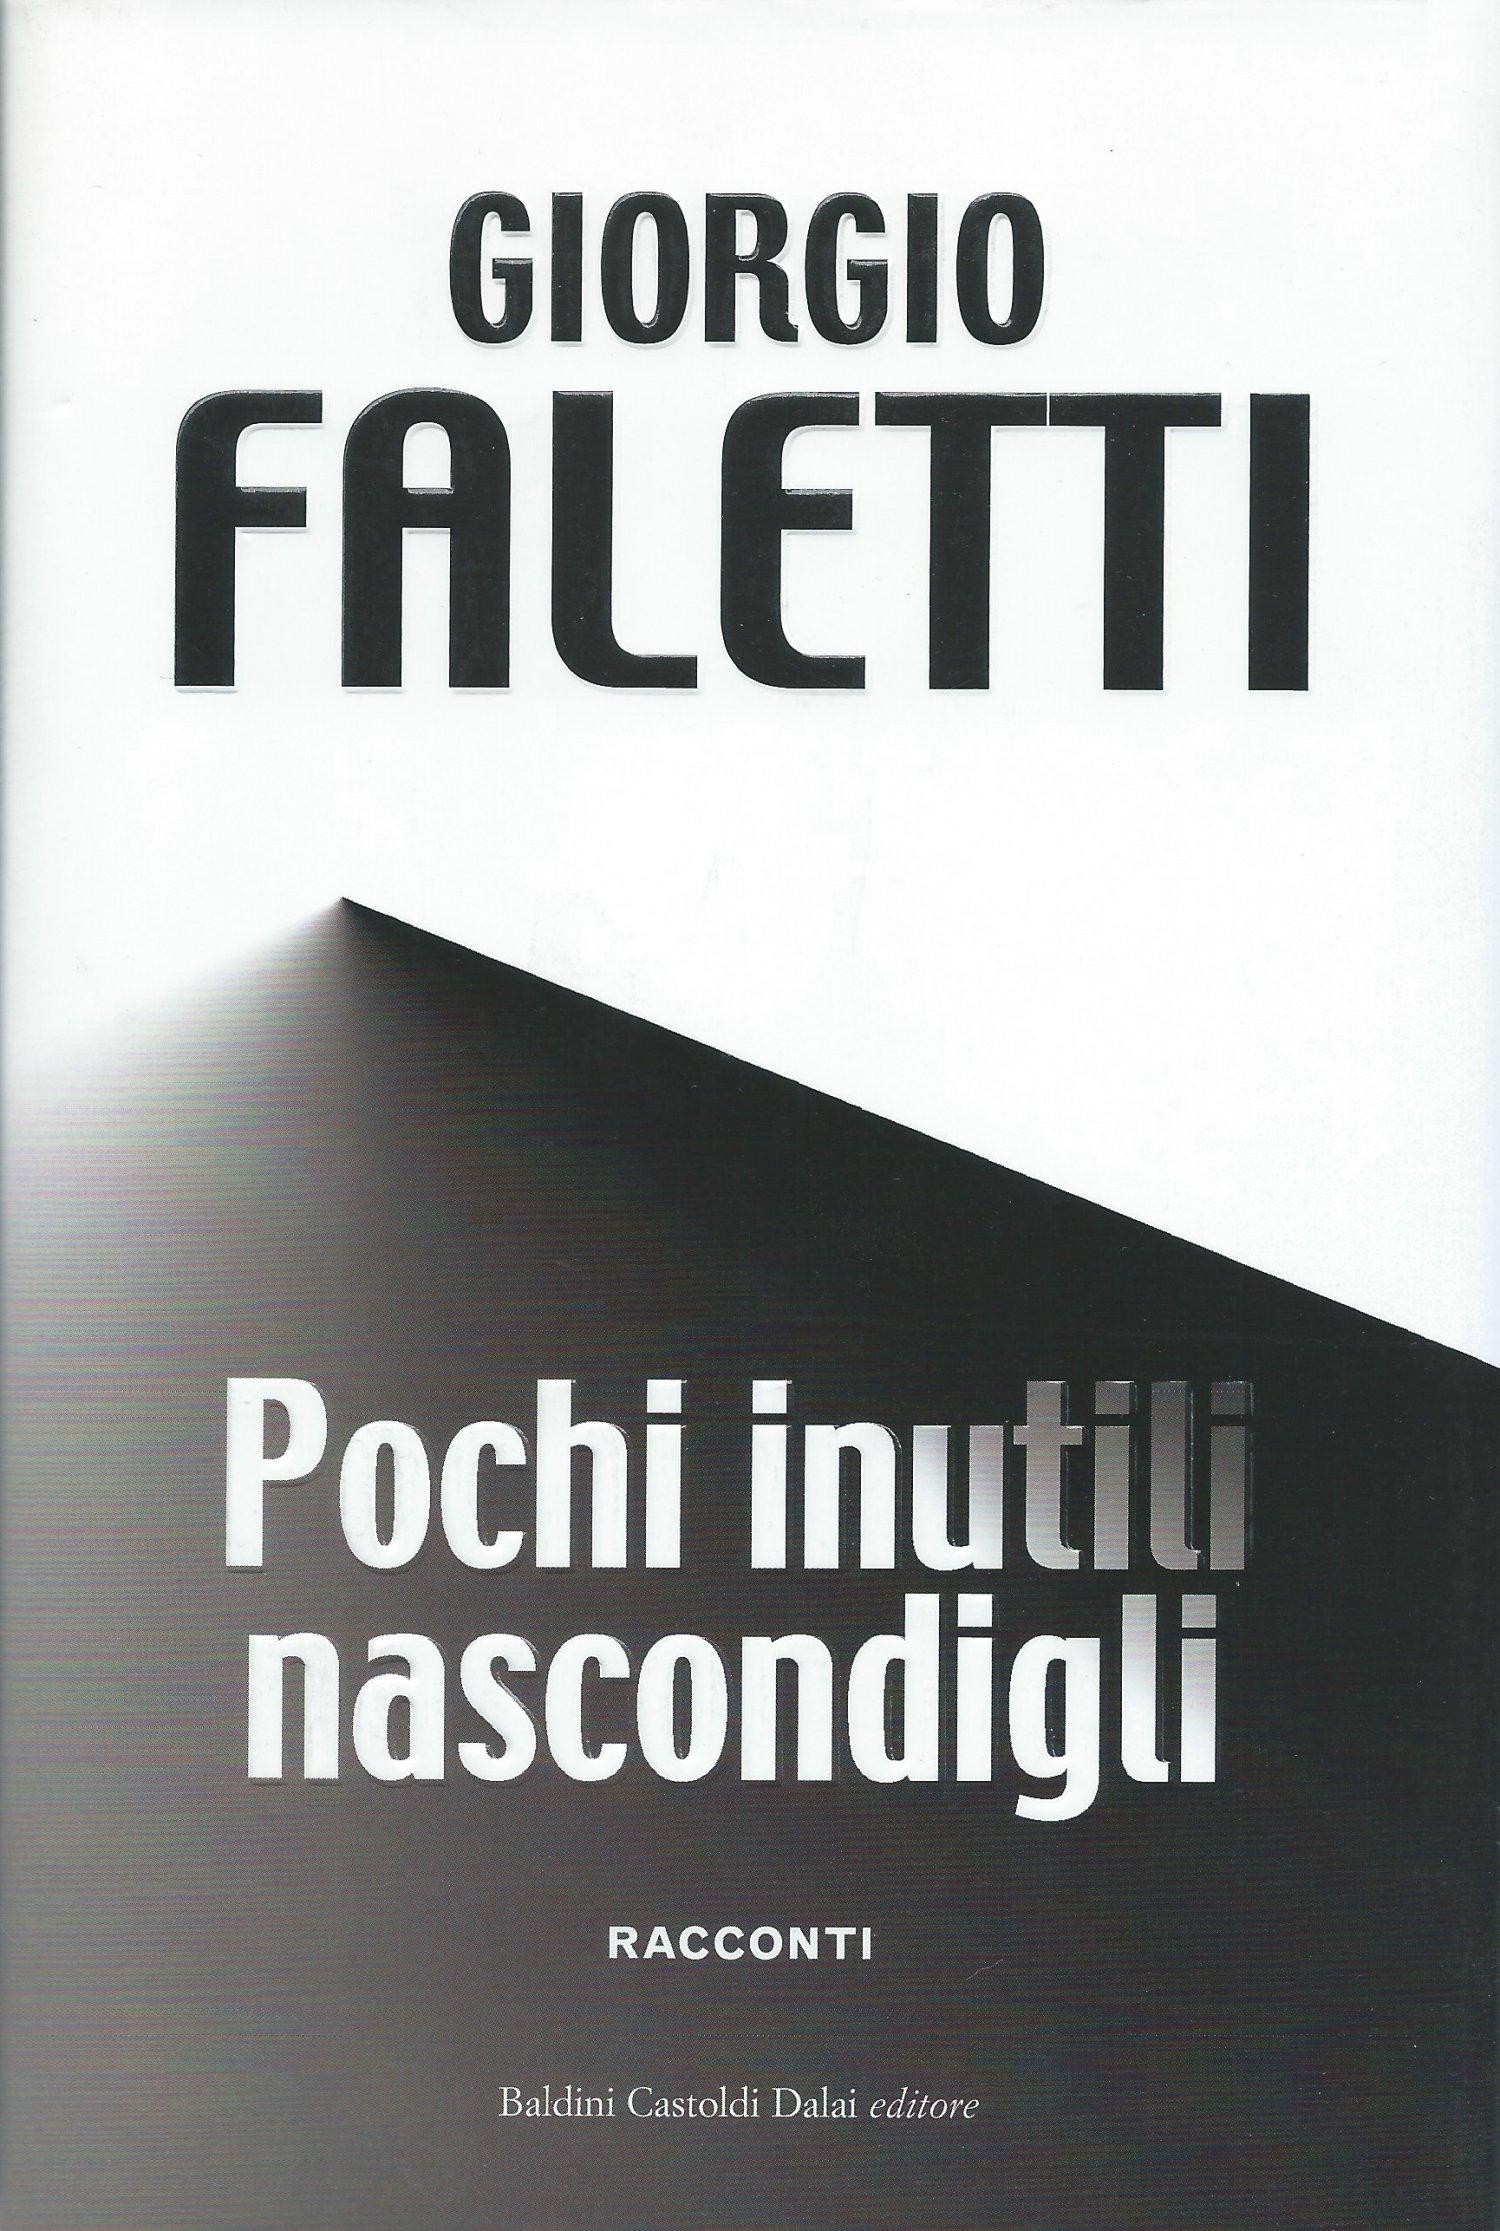 V TURNO - 2 giro - Gialli/Thriller/legal-thriller- si legge: Pochi inutilki nascondigli - Giorgio Faletti Image_book